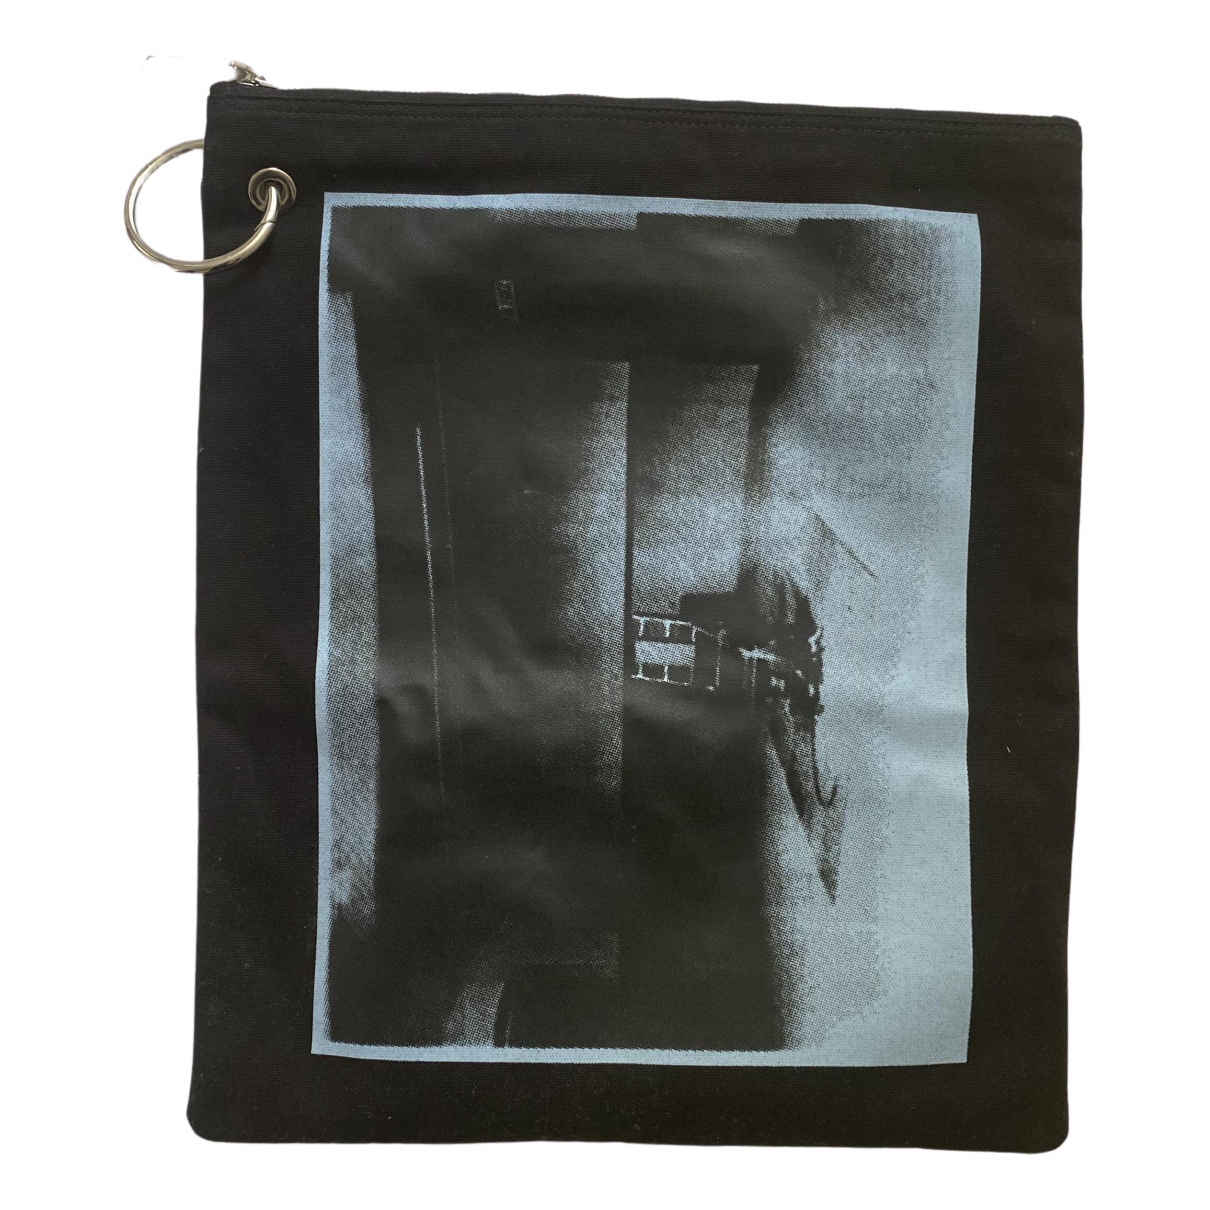 Calvin Klein 205w39nyc \N Black Cotton bag for Men \N